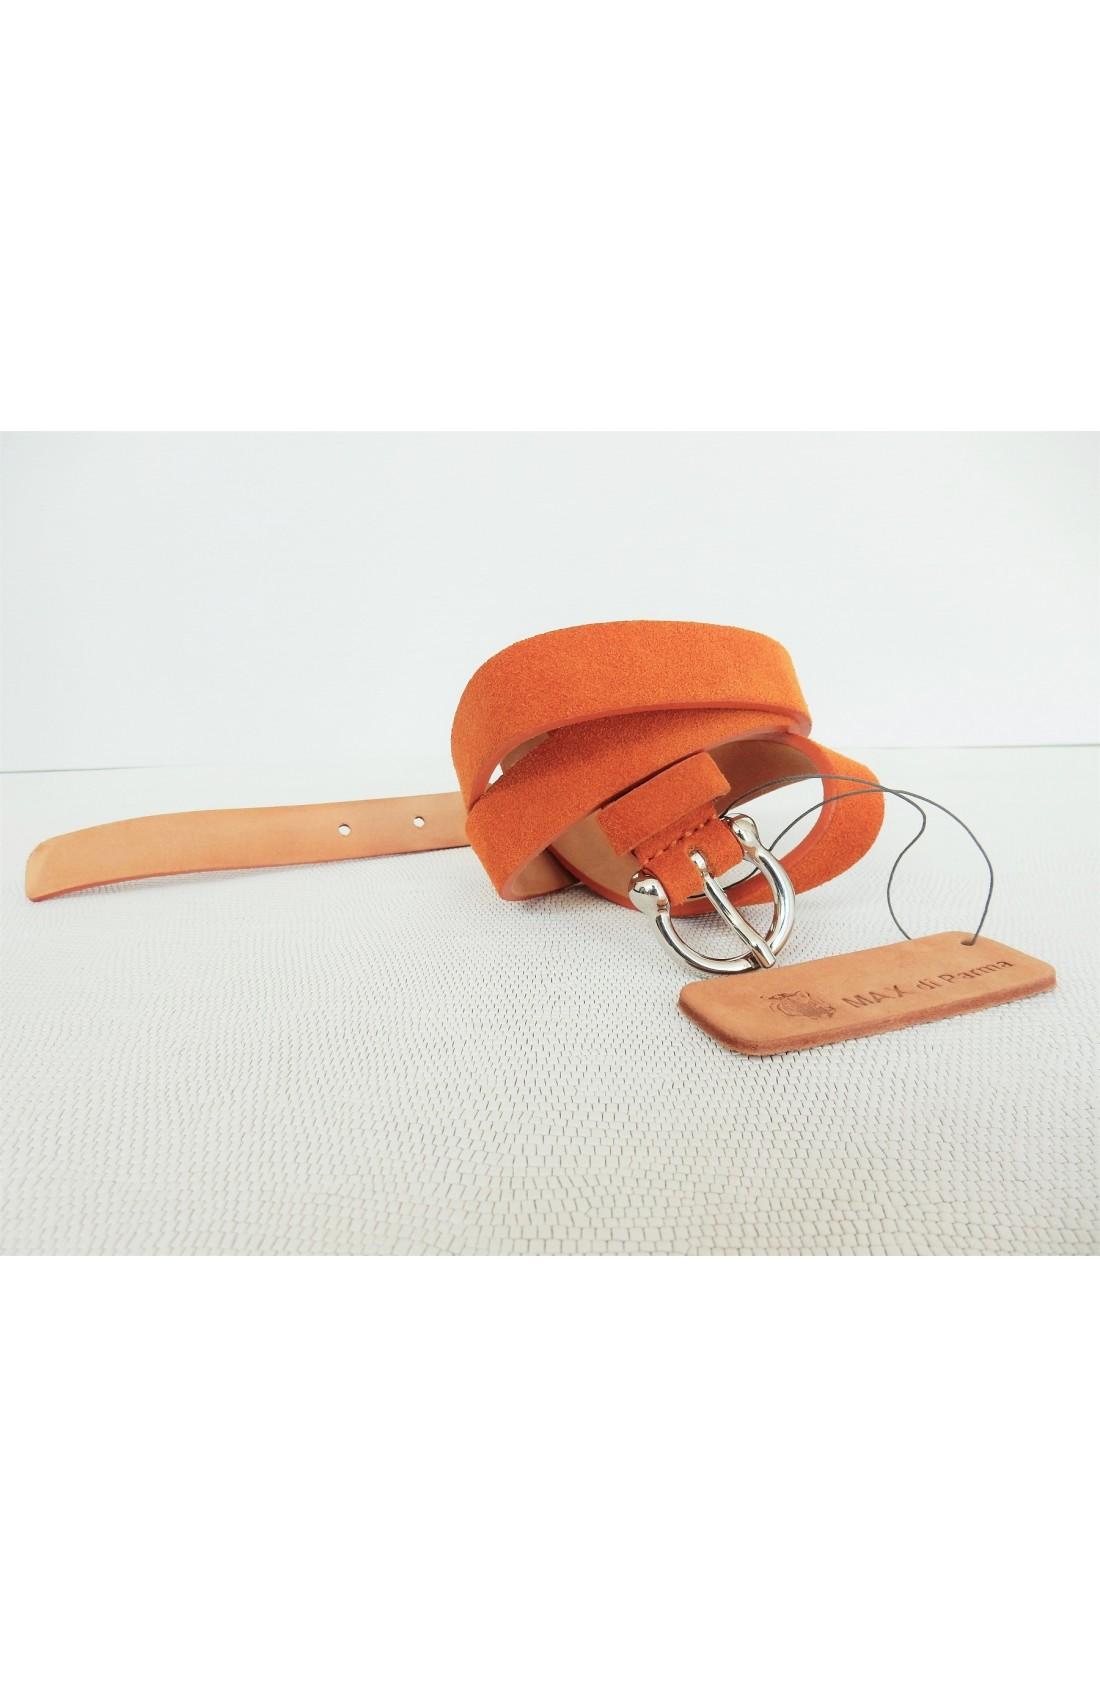 art. 601 SCAMOSCIATO mm.20 var.81 arancio mattone fibbia L 70 mm.20 nikel free (3)